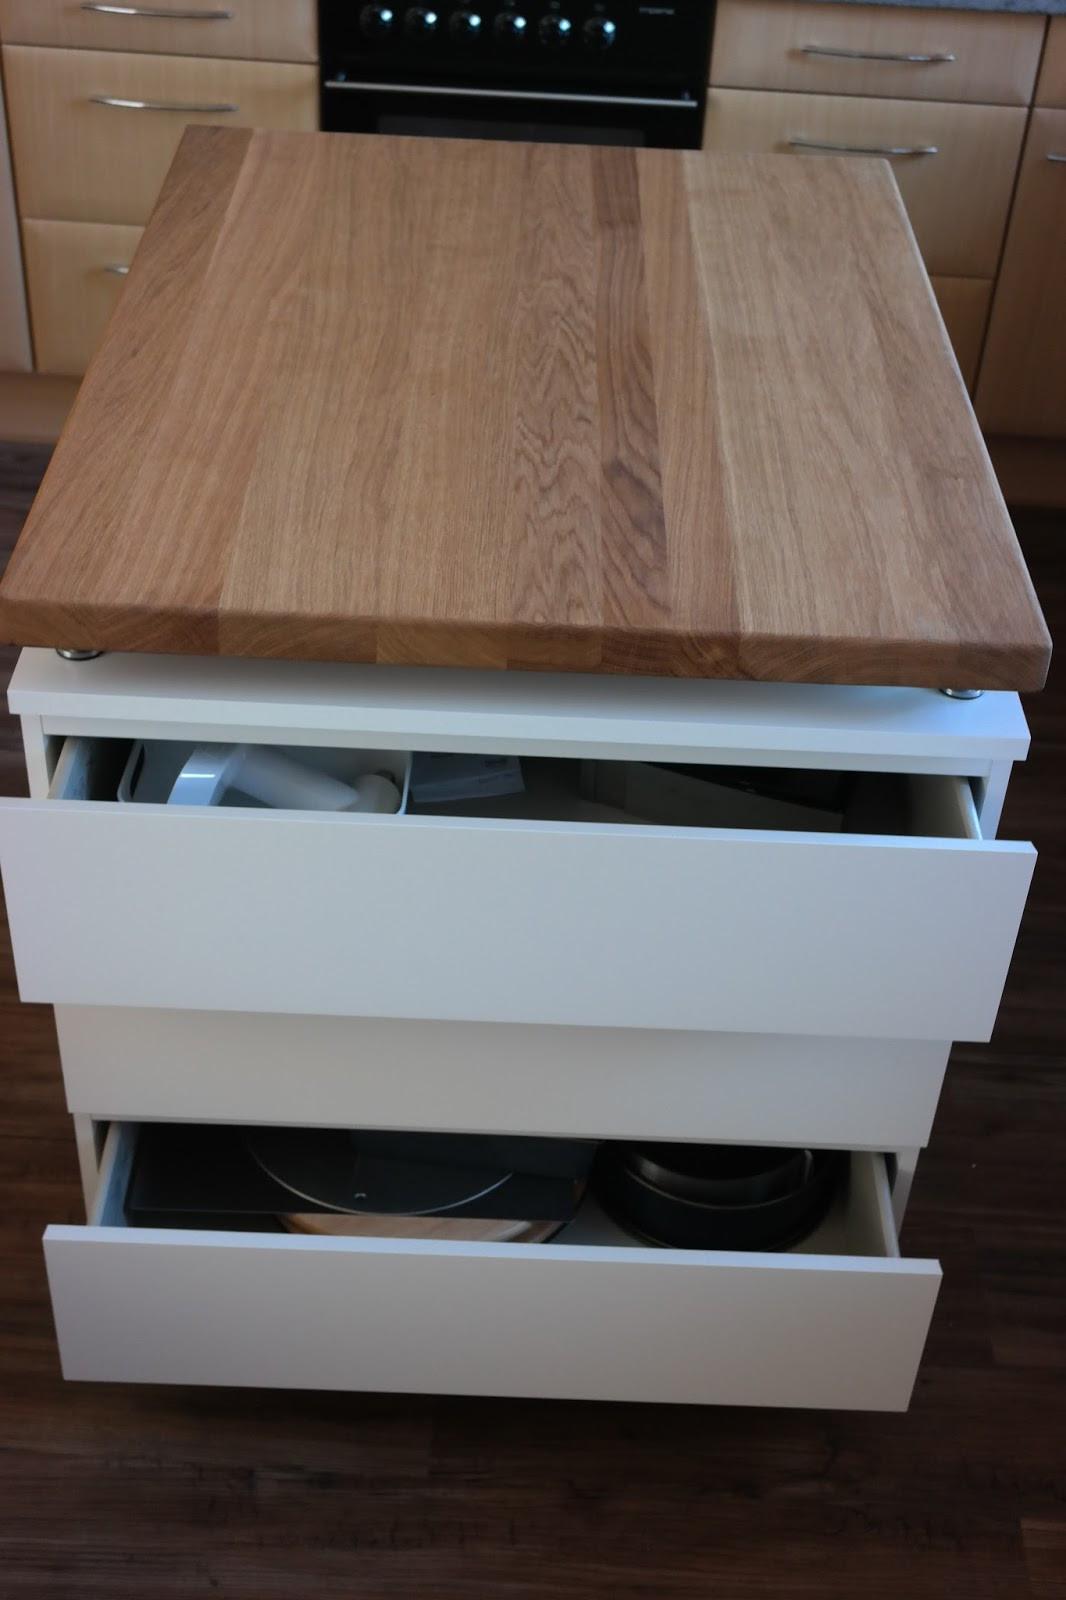 Kücheninsel Diy  Ikea Kücheninsel DIY – Miss Zuckerfee